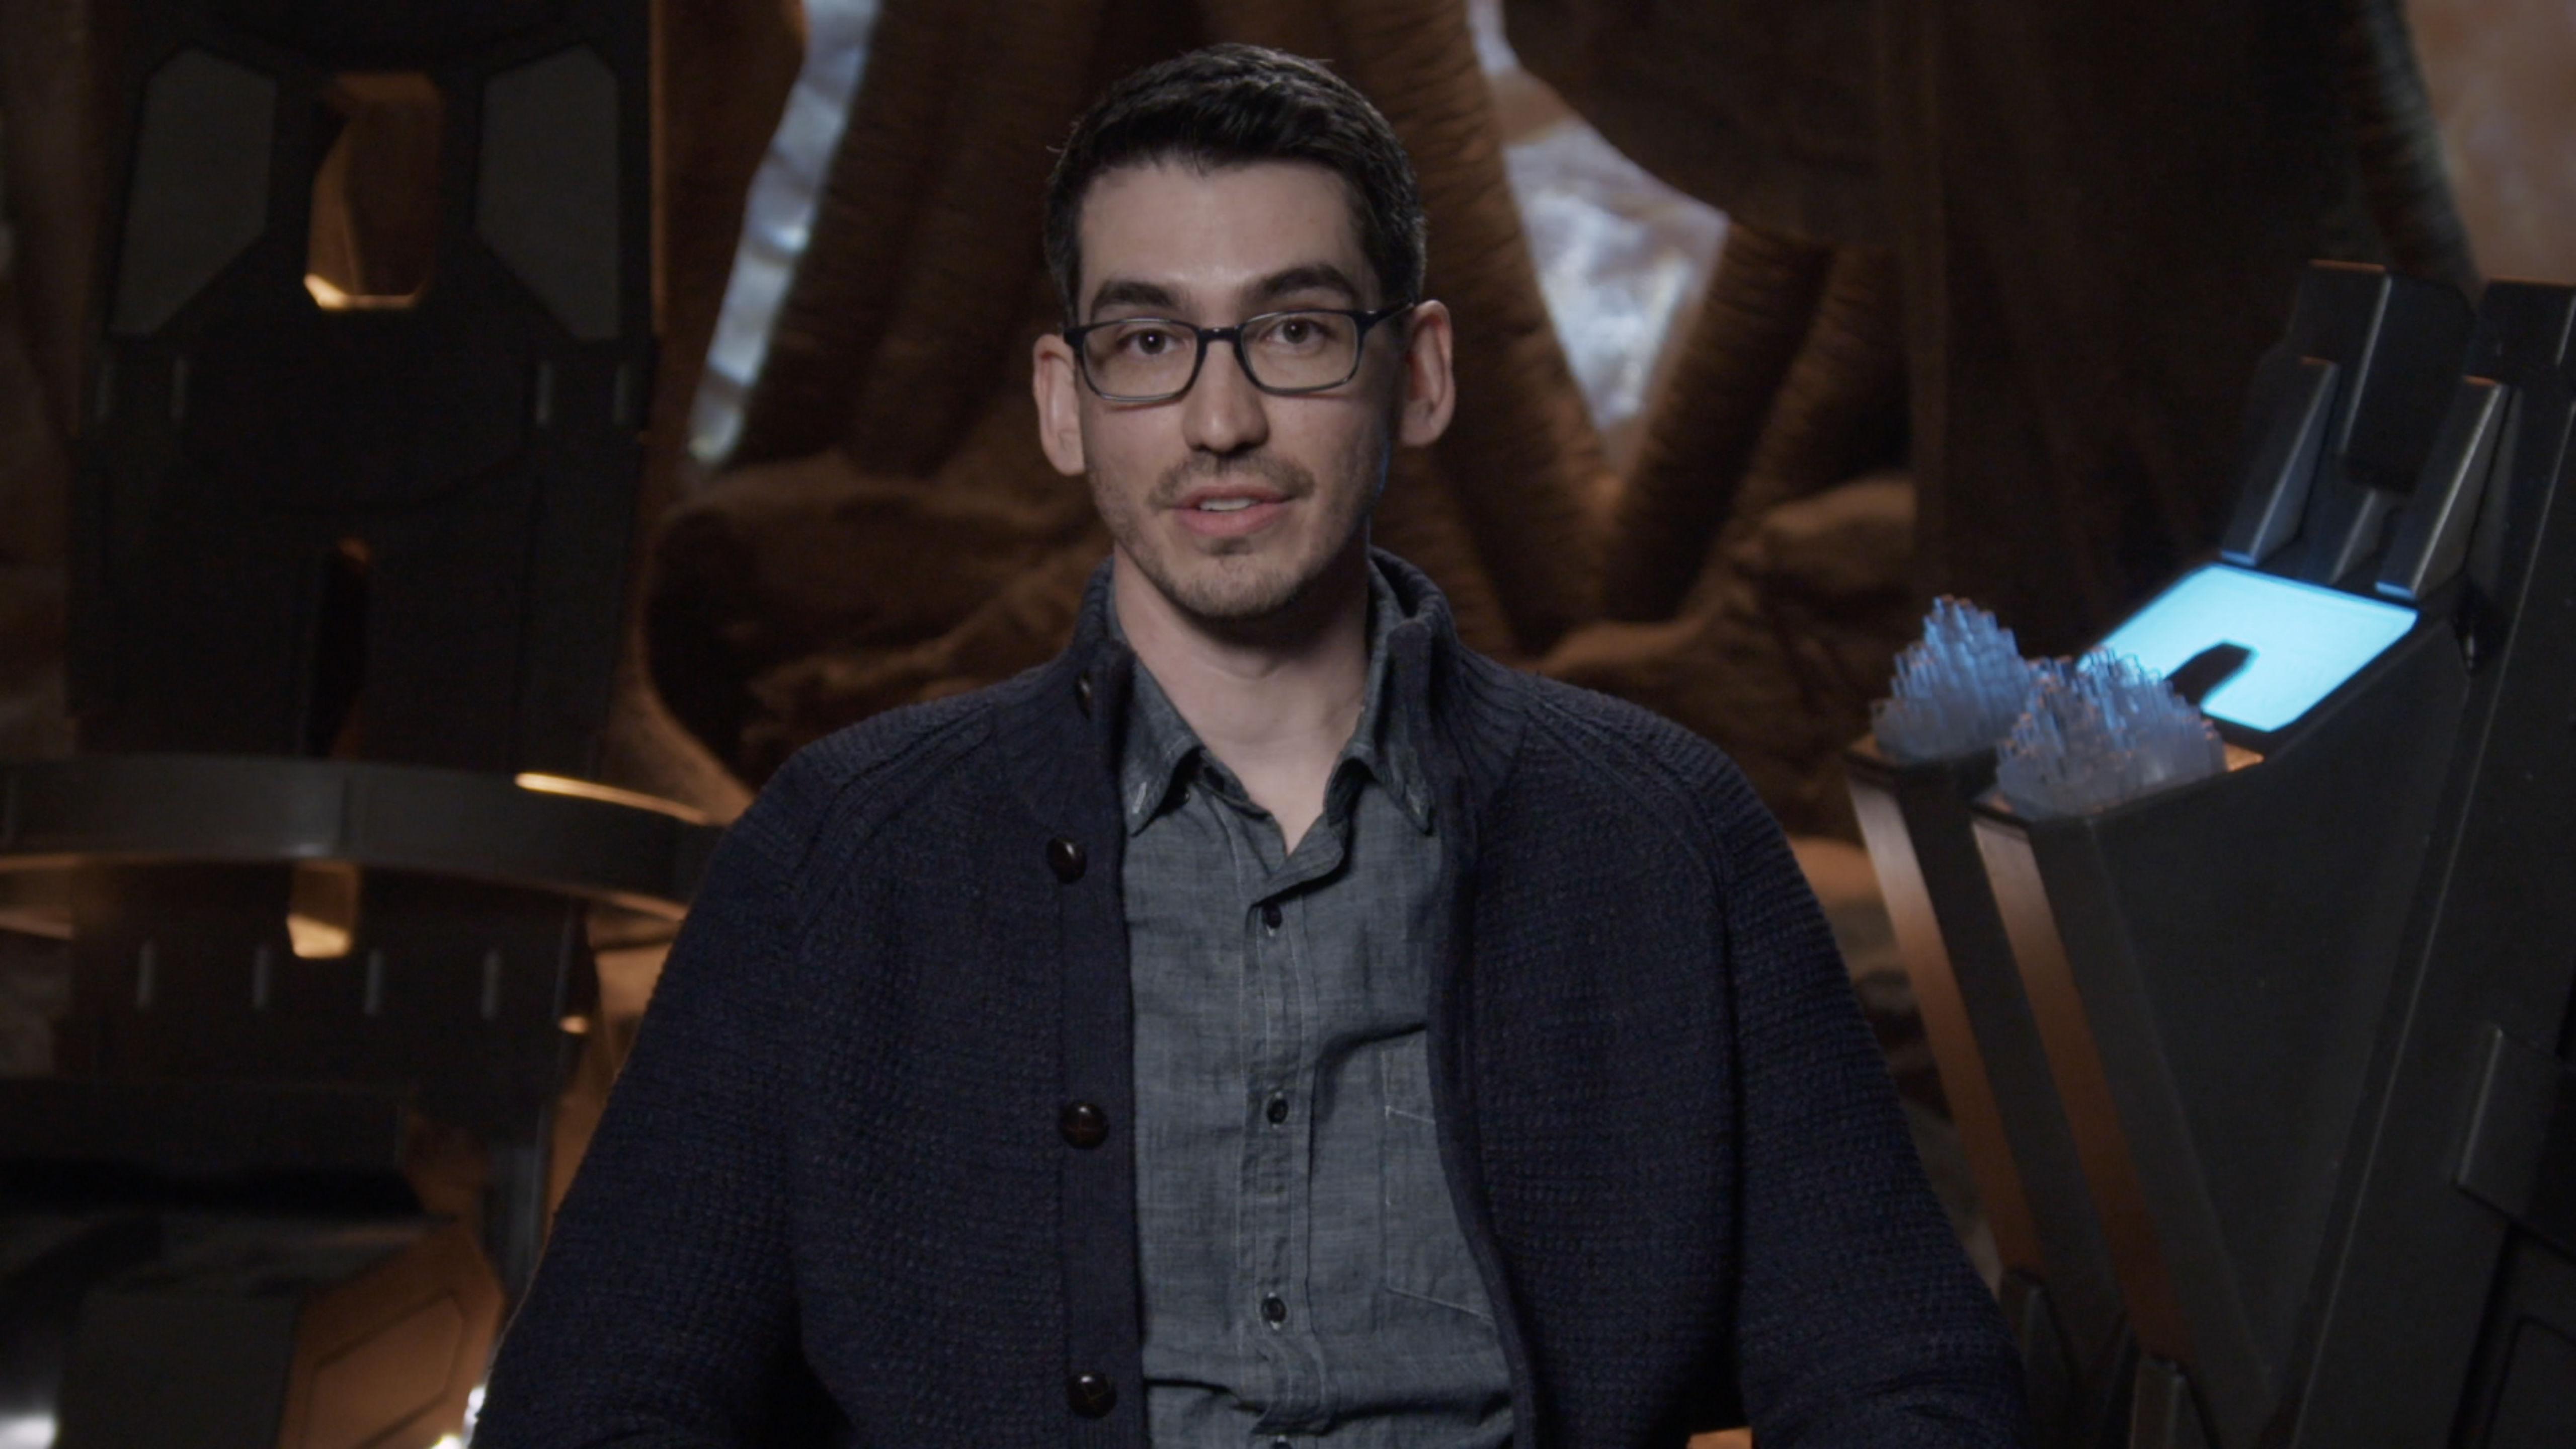 Krypton News – Krypton's Co-Executive Producer Luke Kalteux Talks